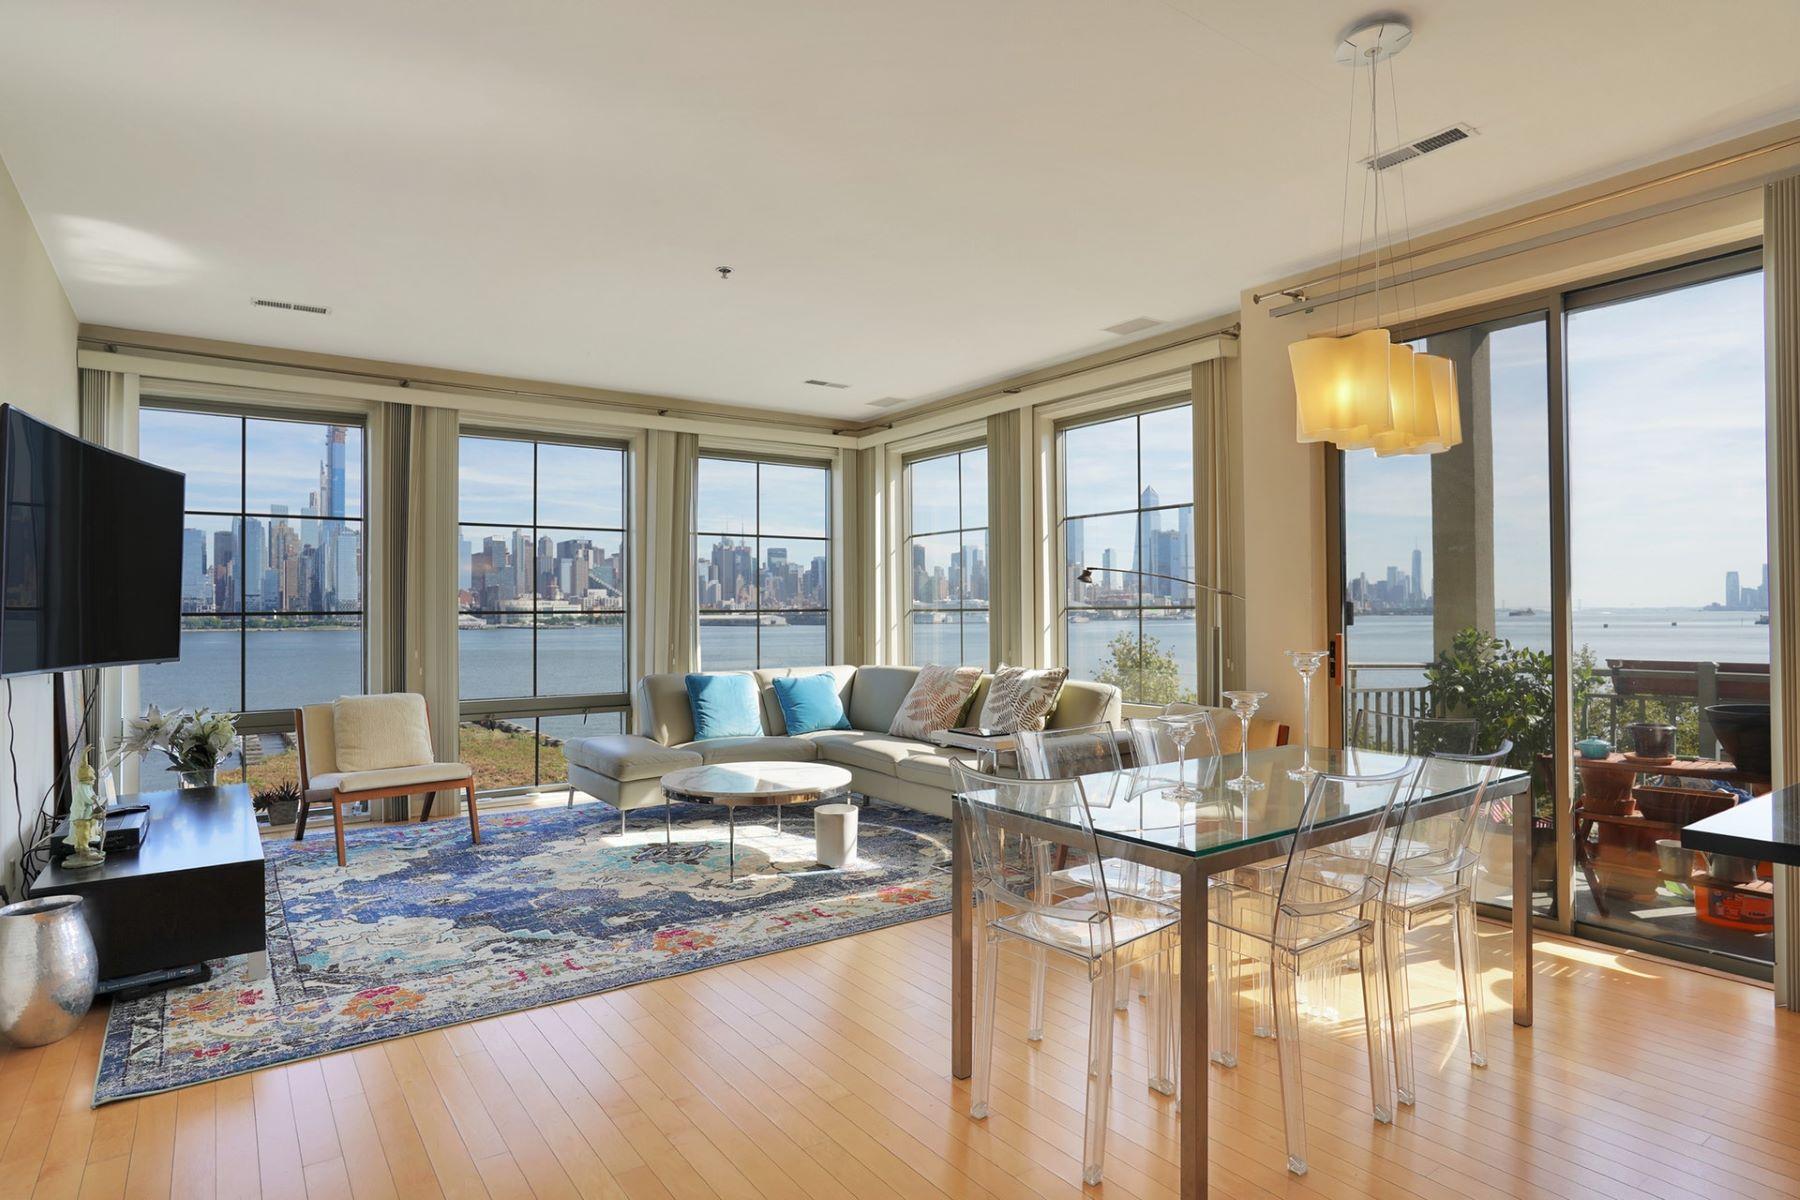 Condominiums för Försäljning vid Enjoy this stunning South East home with NYC and the Hudson River views i 24 Avenue at Port Imperial #303, West New York, New Jersey 07093 Förenta staterna